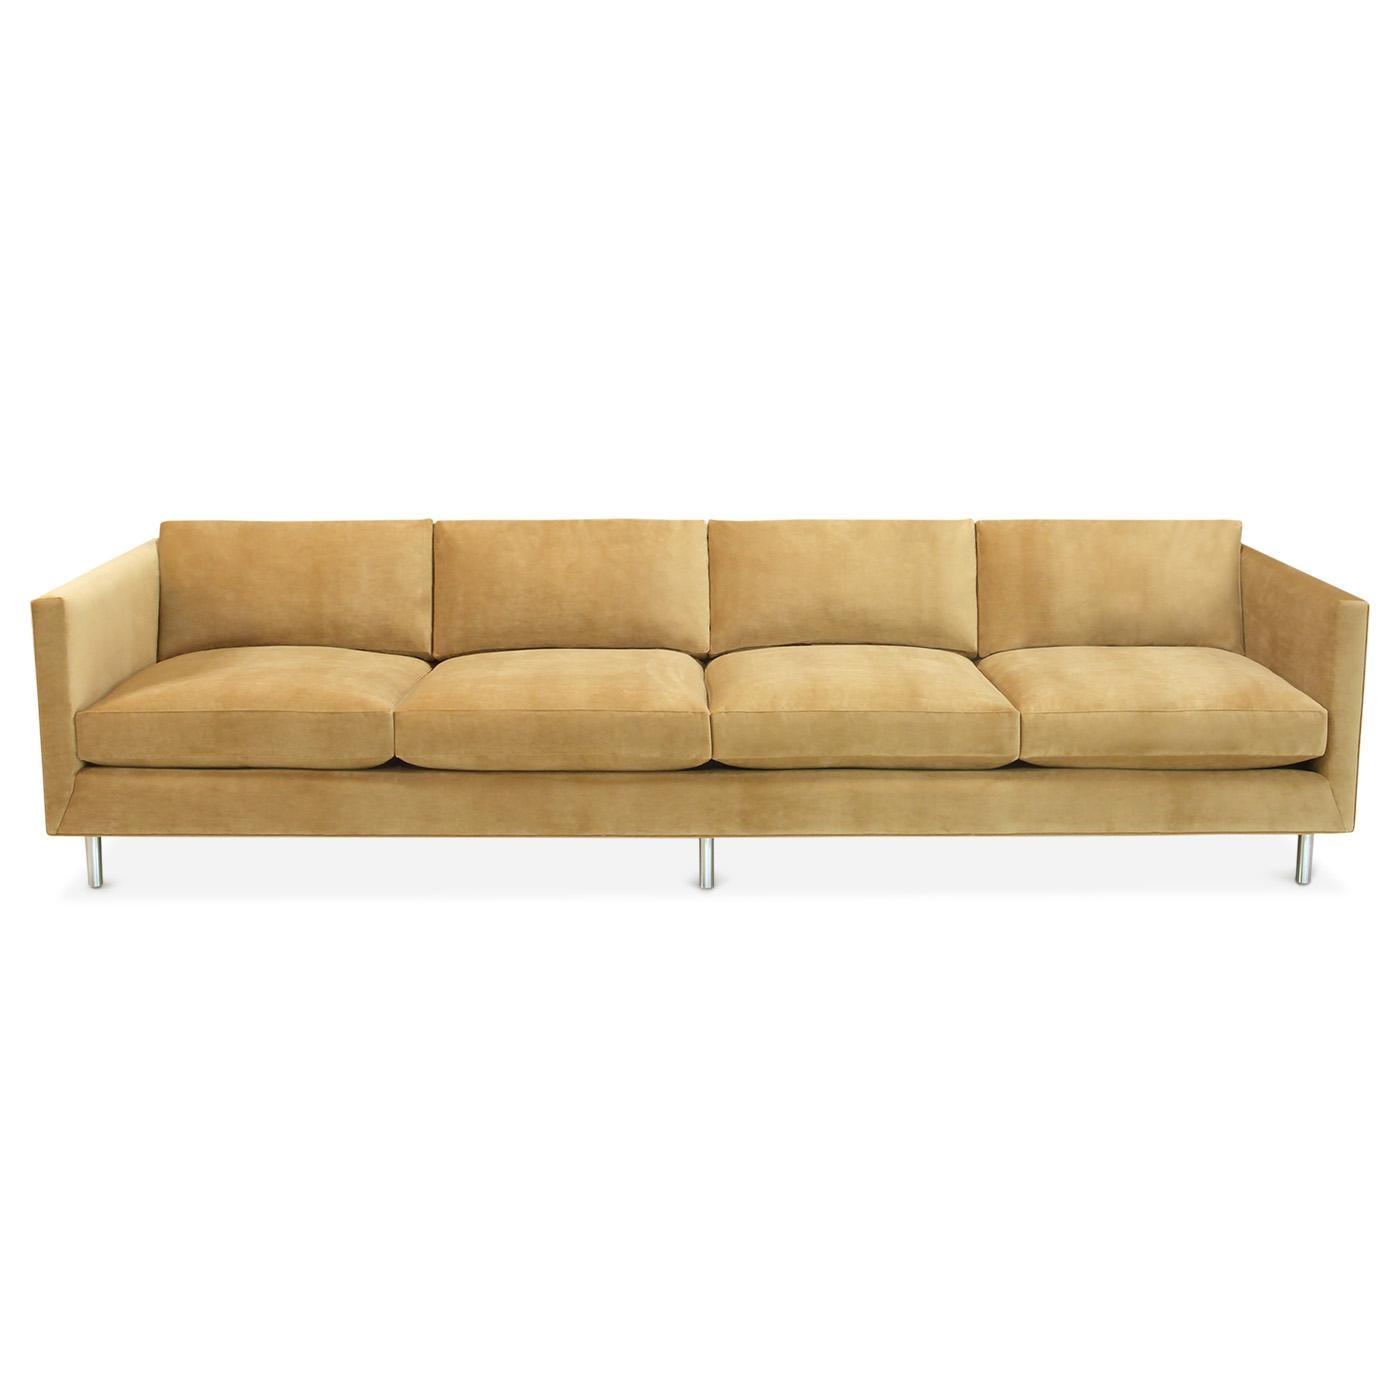 Topanga Four Seater Sofa | Modern Furniture | Jonathan Adler Within Four Seater Sofas (Image 19 of 20)